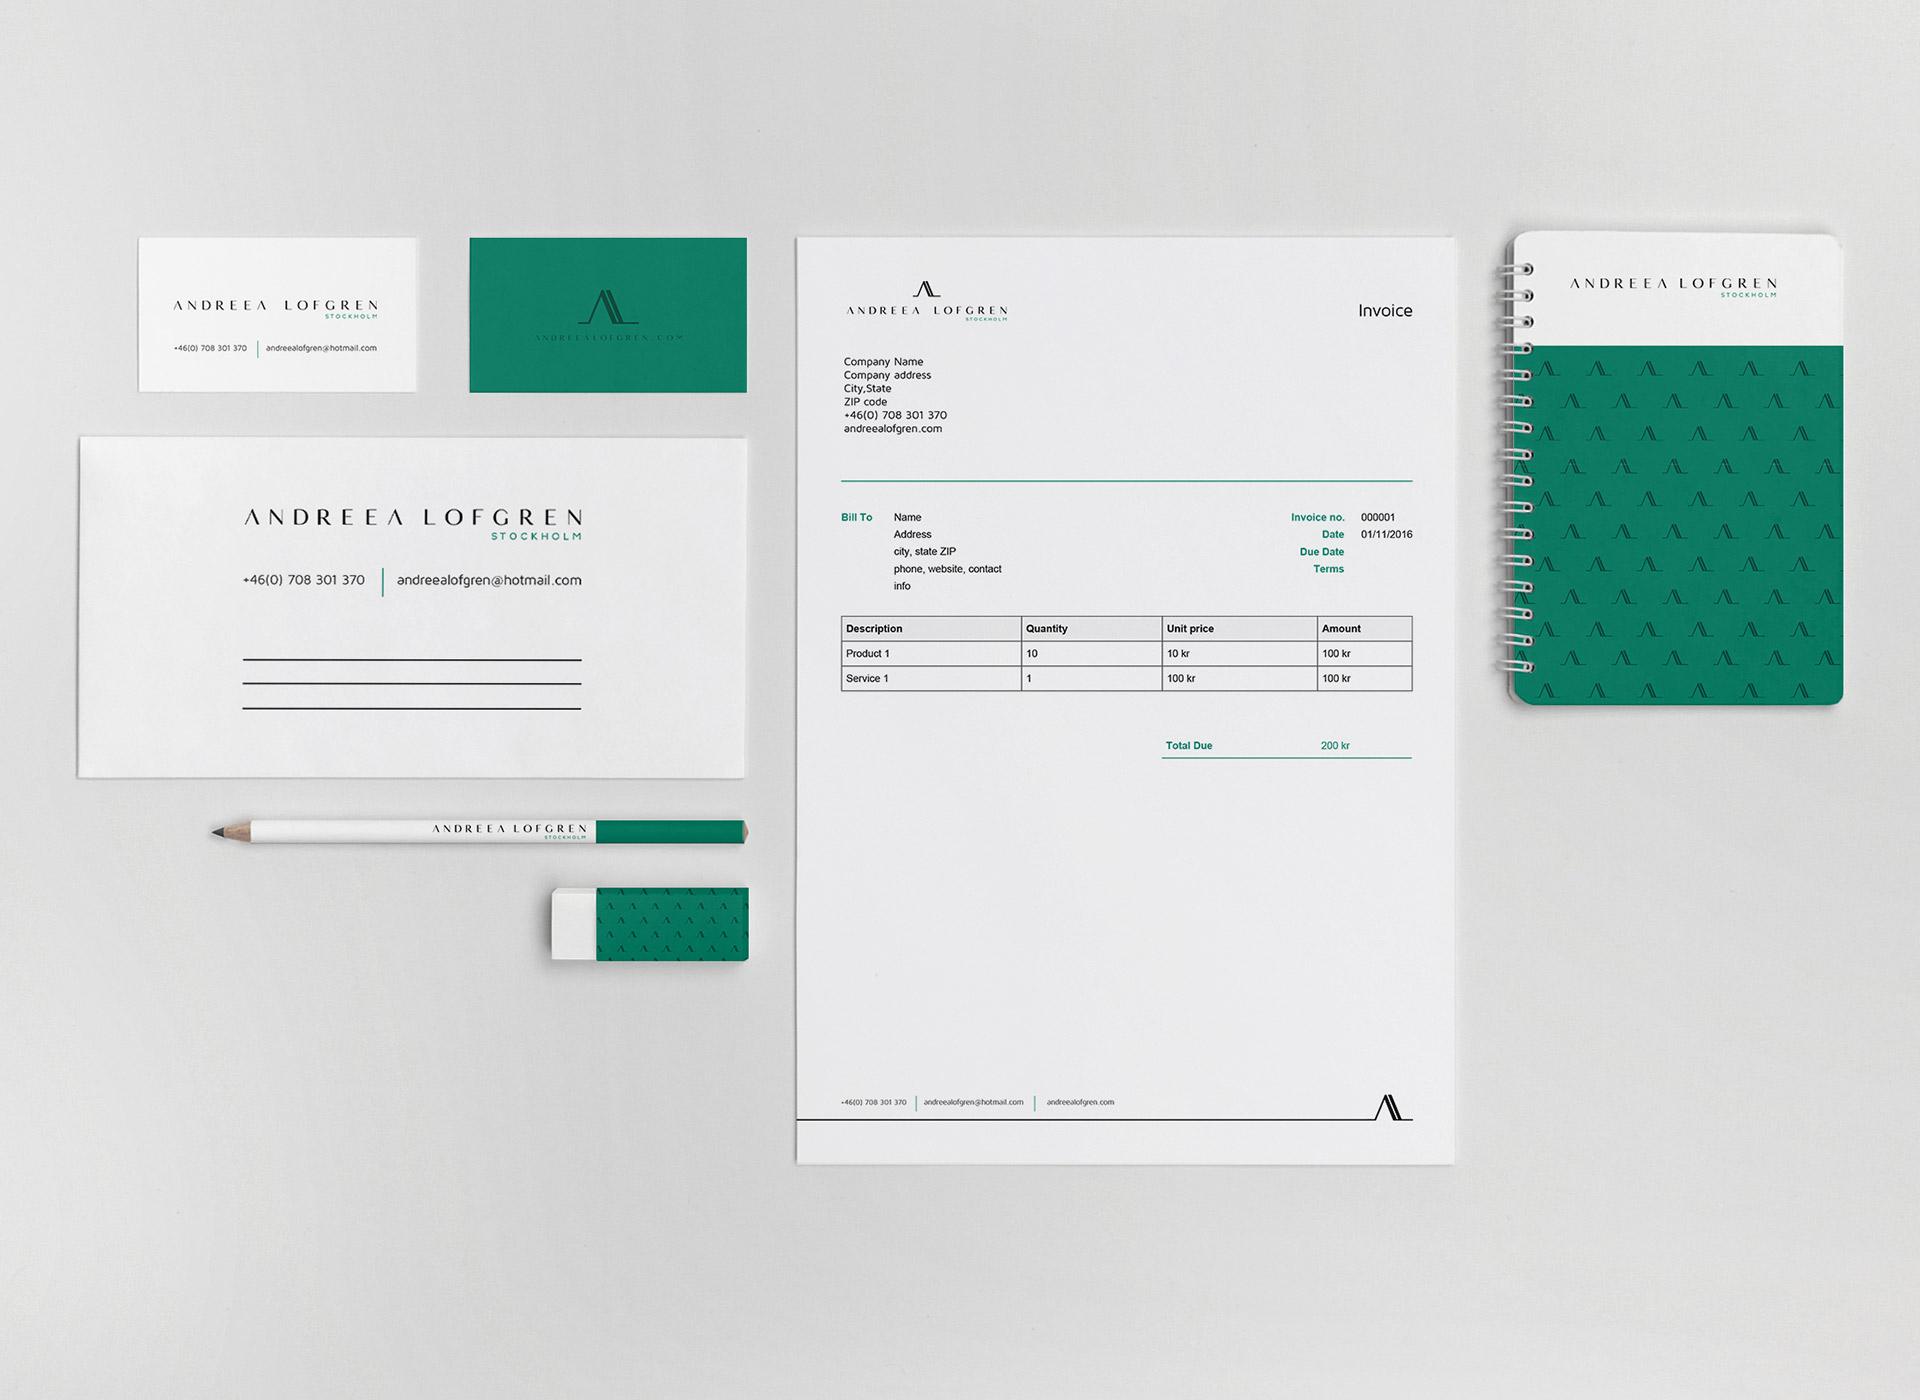 Andreea Lofgren portfolio inoveo stationery